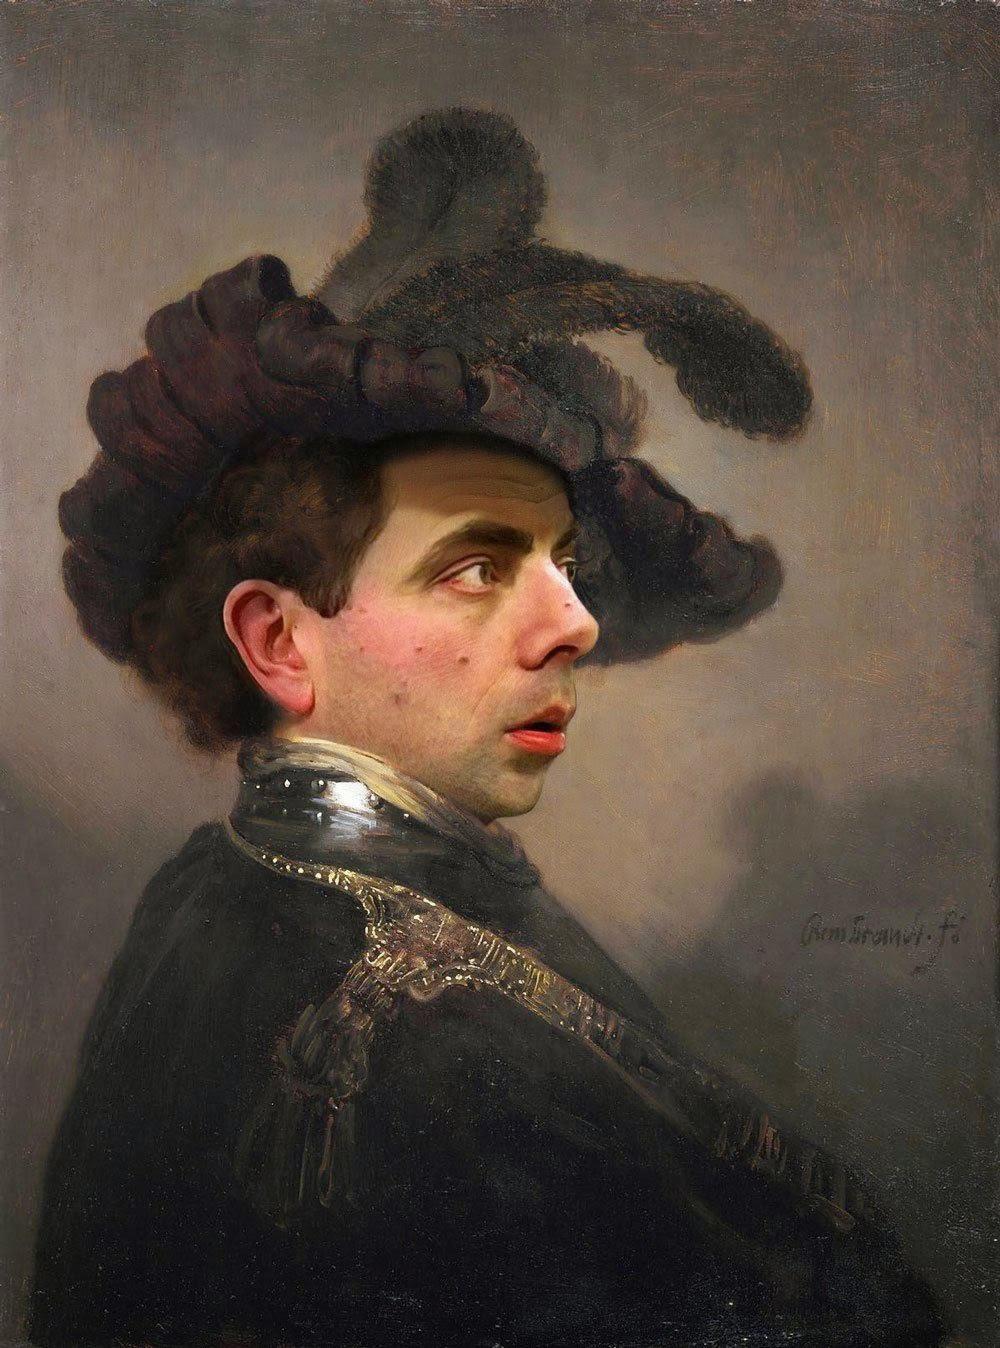 Lukisan Mr Bean Yang Lucu UNIK ANEH MENARIK LUCU